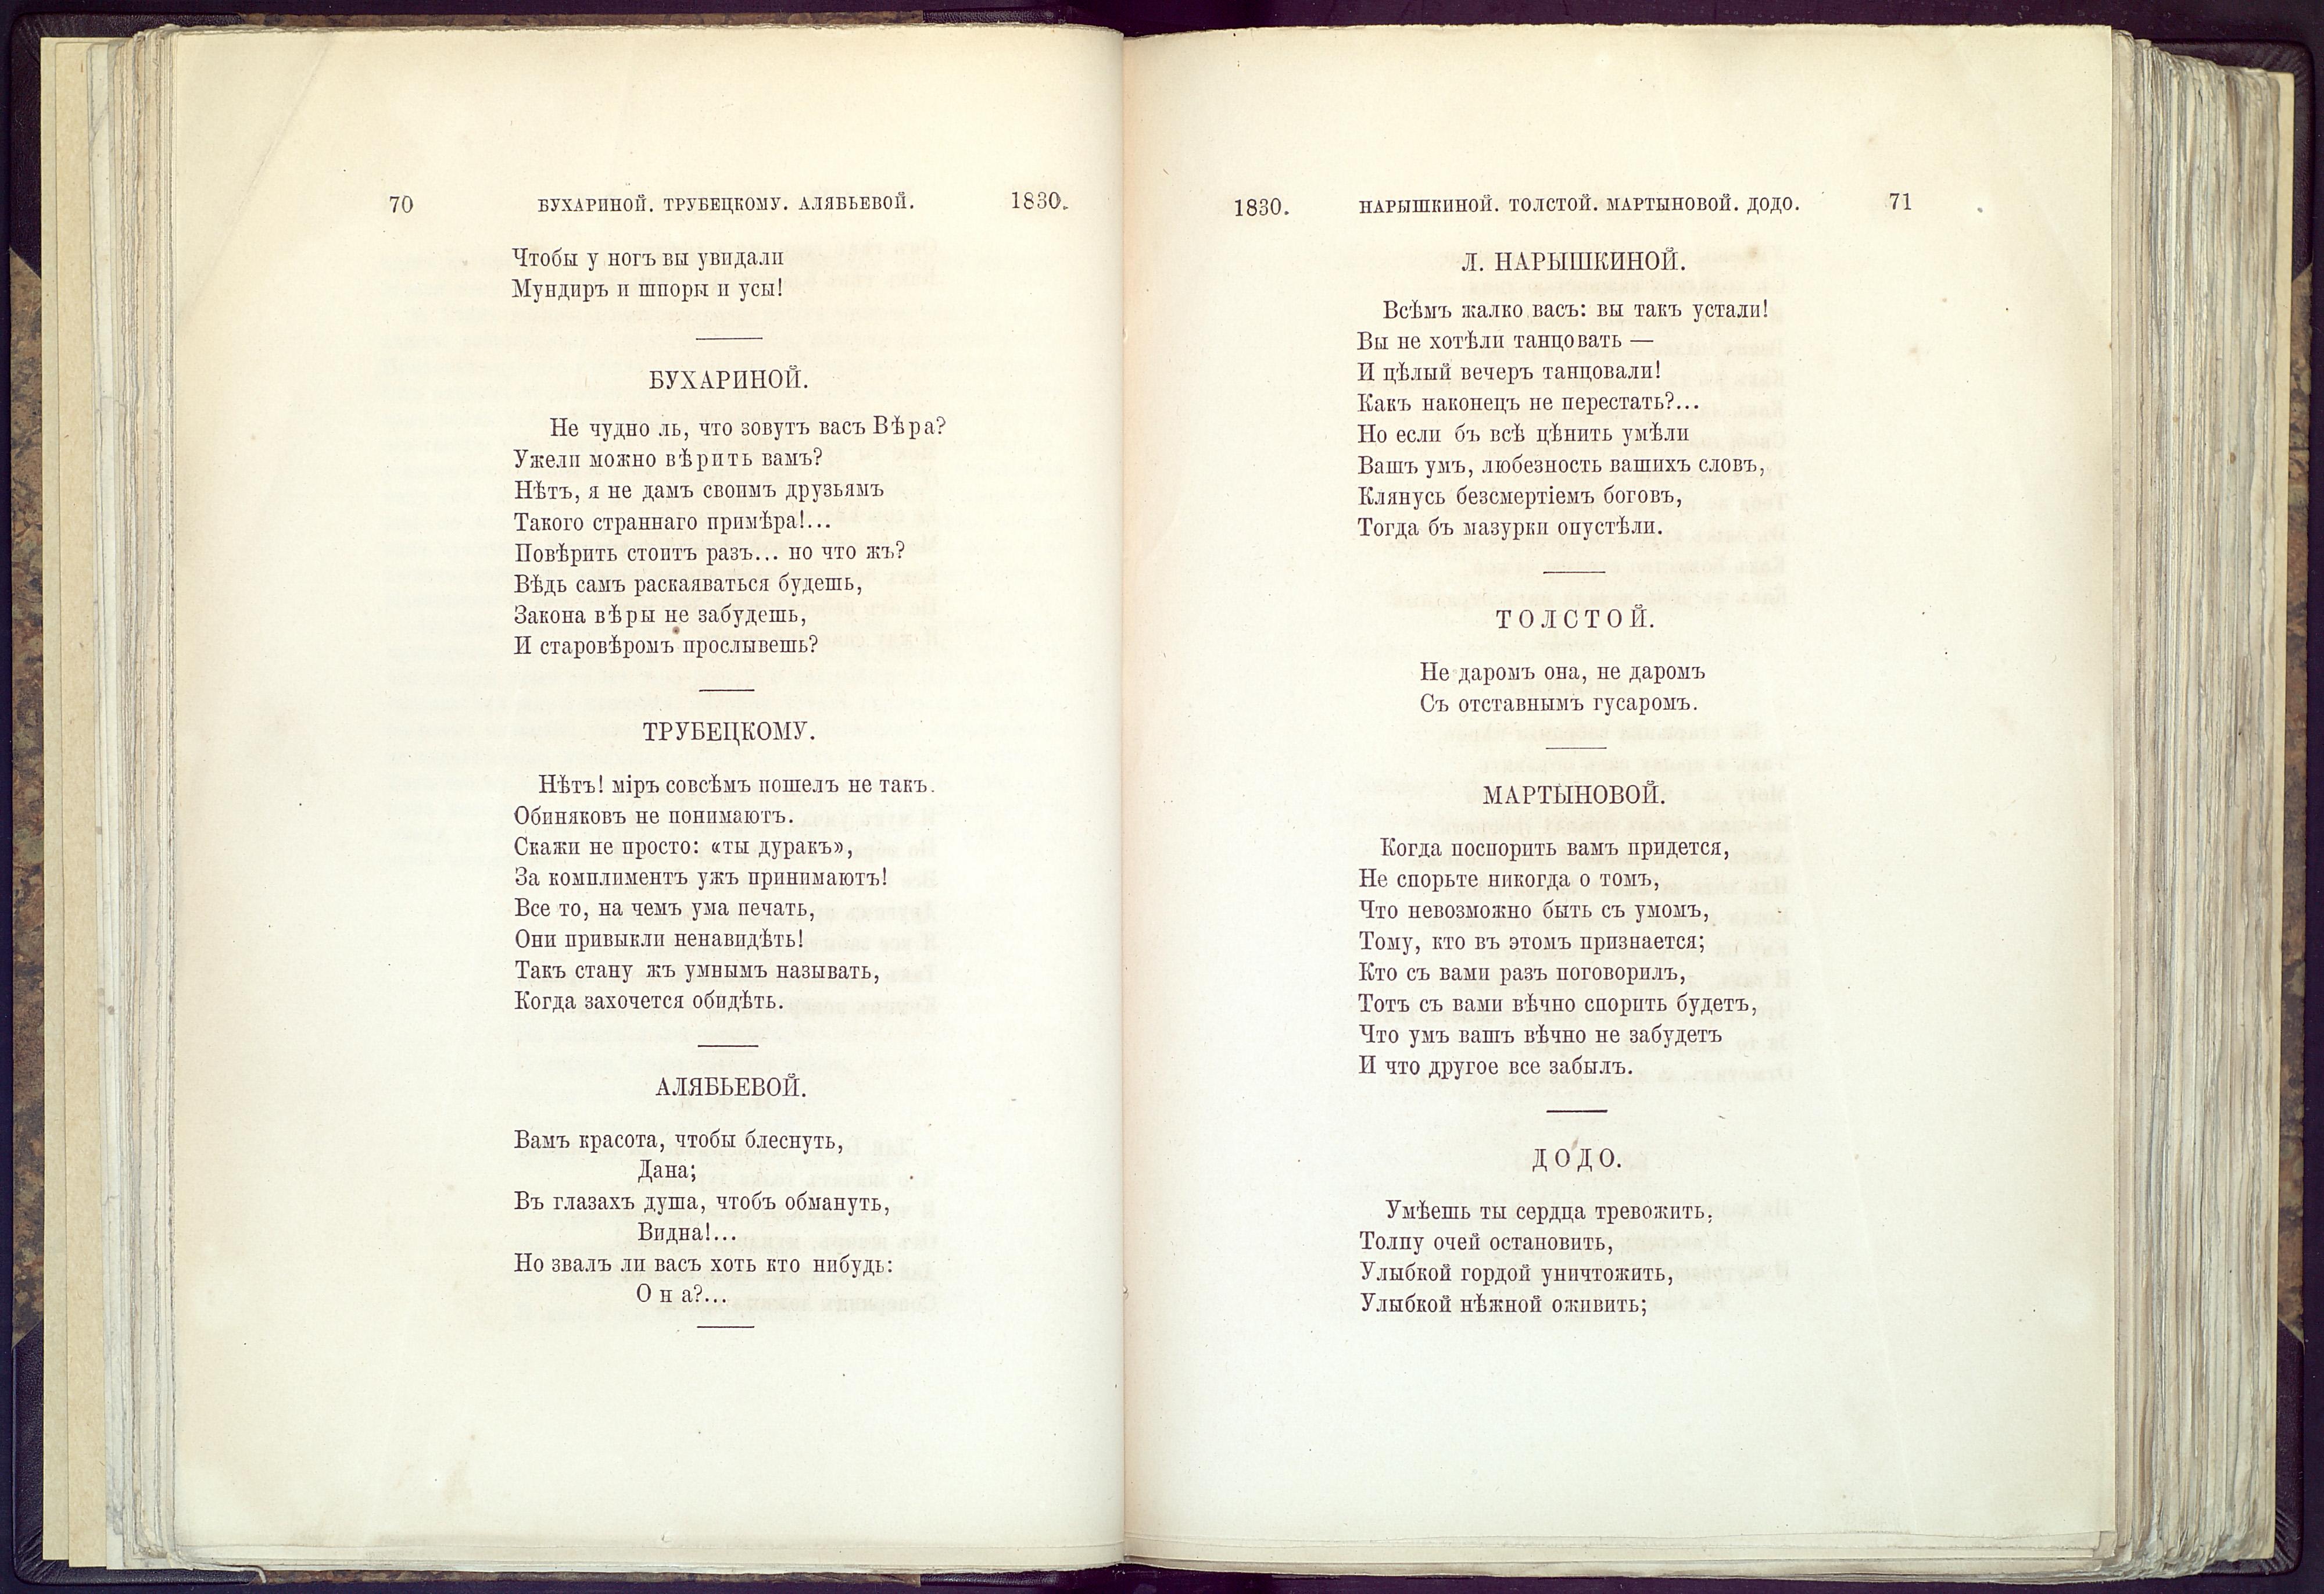 ЛОК-826 ТАРХАНЫ КП-1803 М.Ю.Лермонтов Книга Сочинения. Т. 2._2